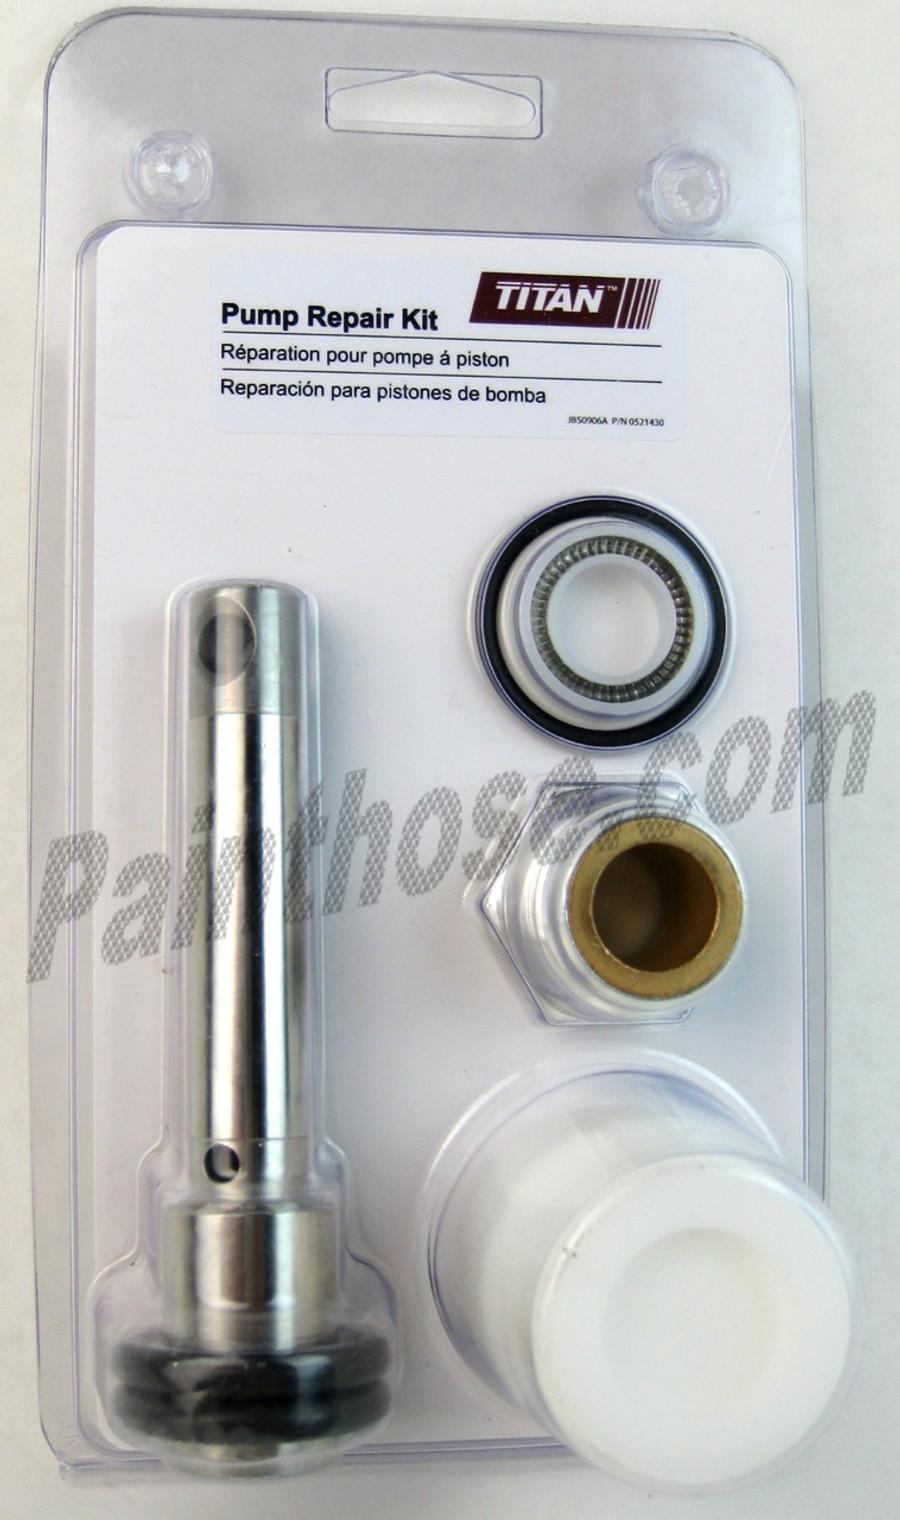 Wagner Spraytech 0512223 / 512223 Pump Repair Kit